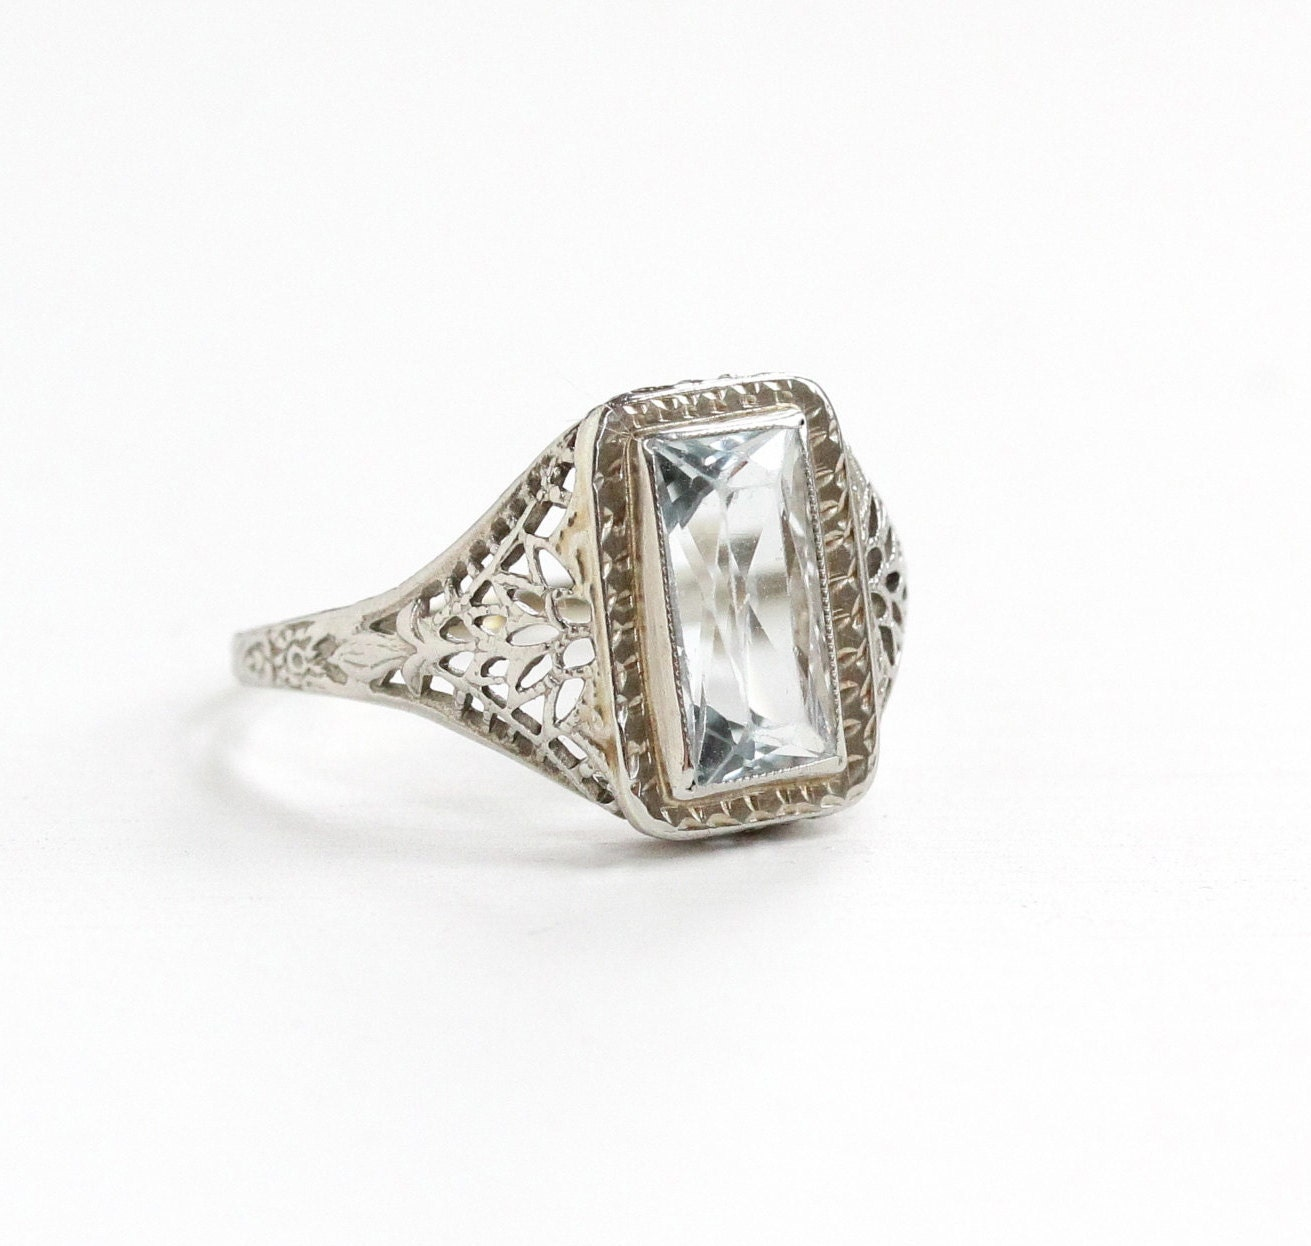 Sale Antique 14k White Gold Filigree Aquamarine Ring Size